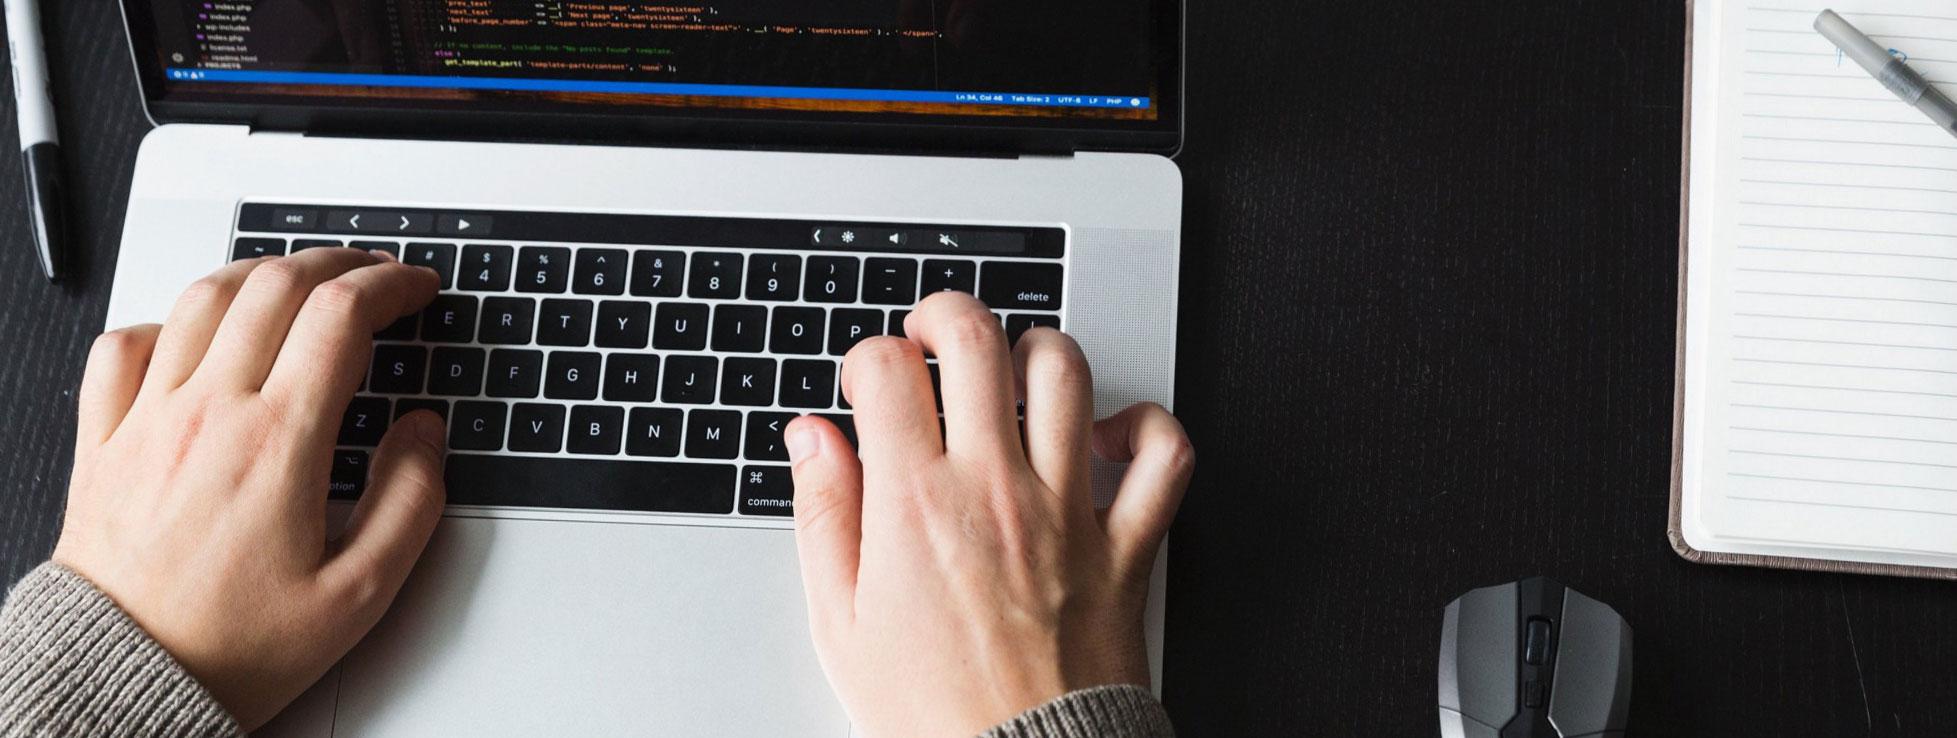 Intervento Tecnico WordPress Rapido